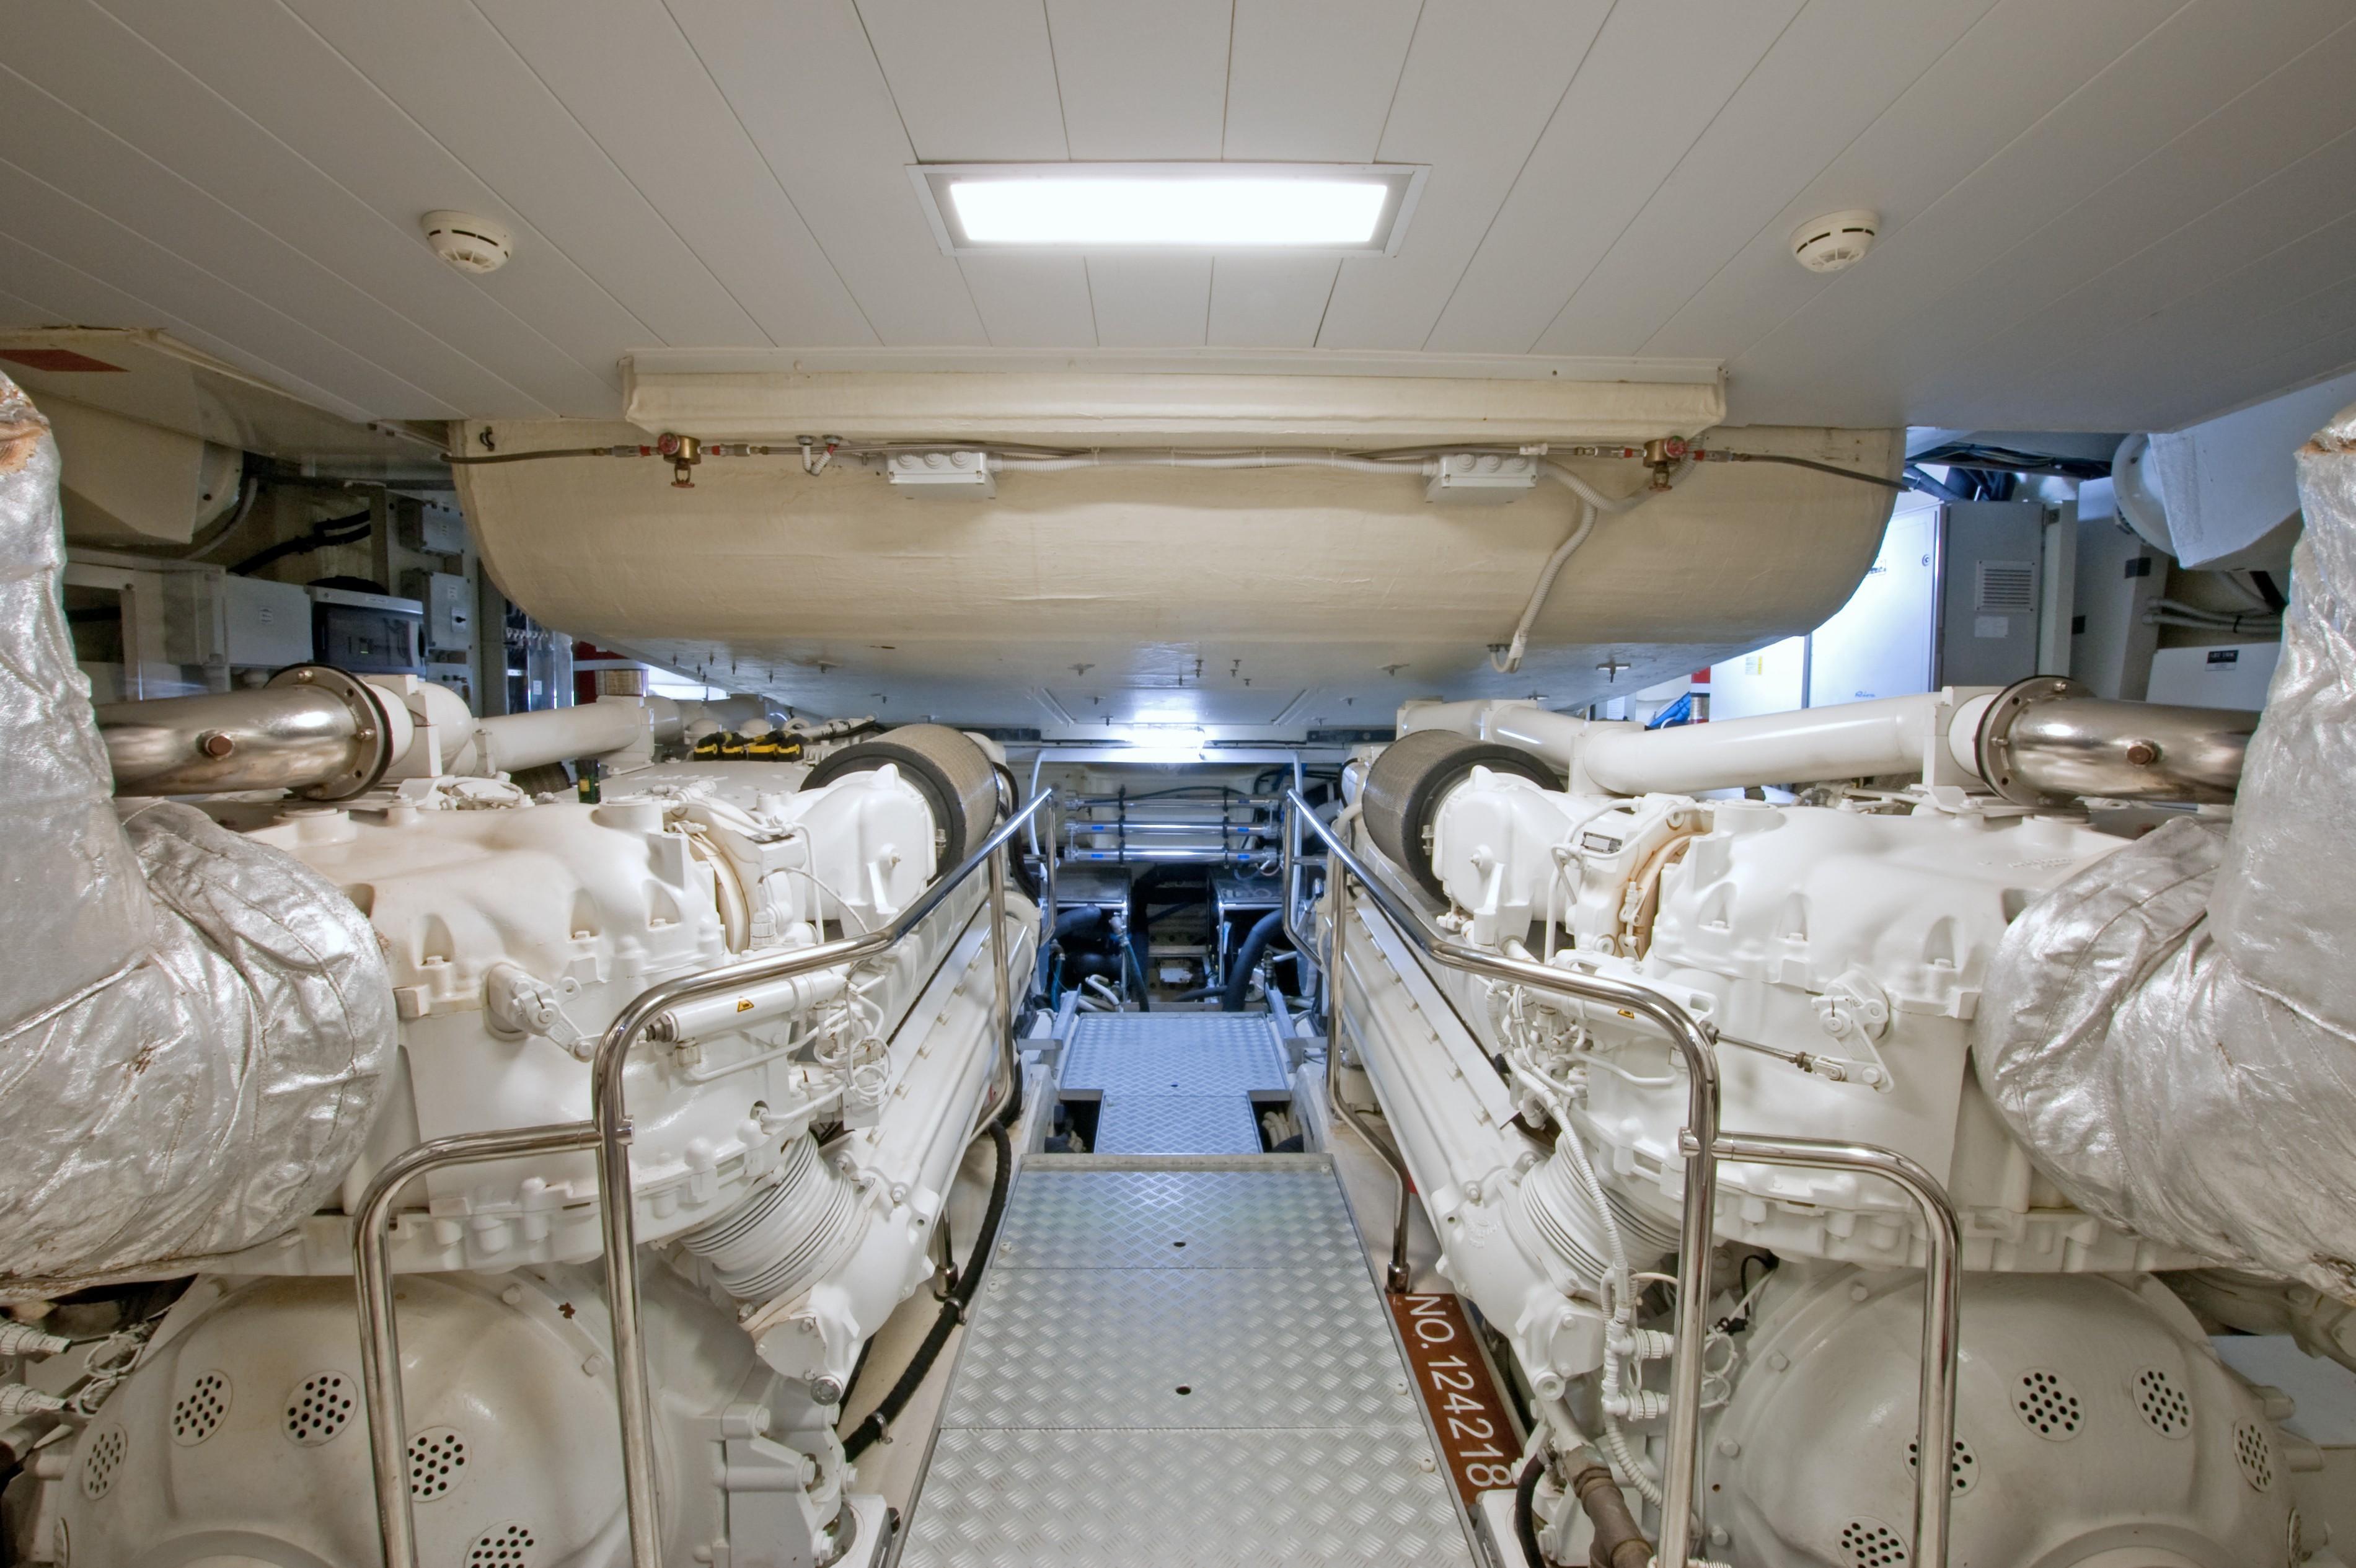 2012 Riva 86 Domino - Engine Room